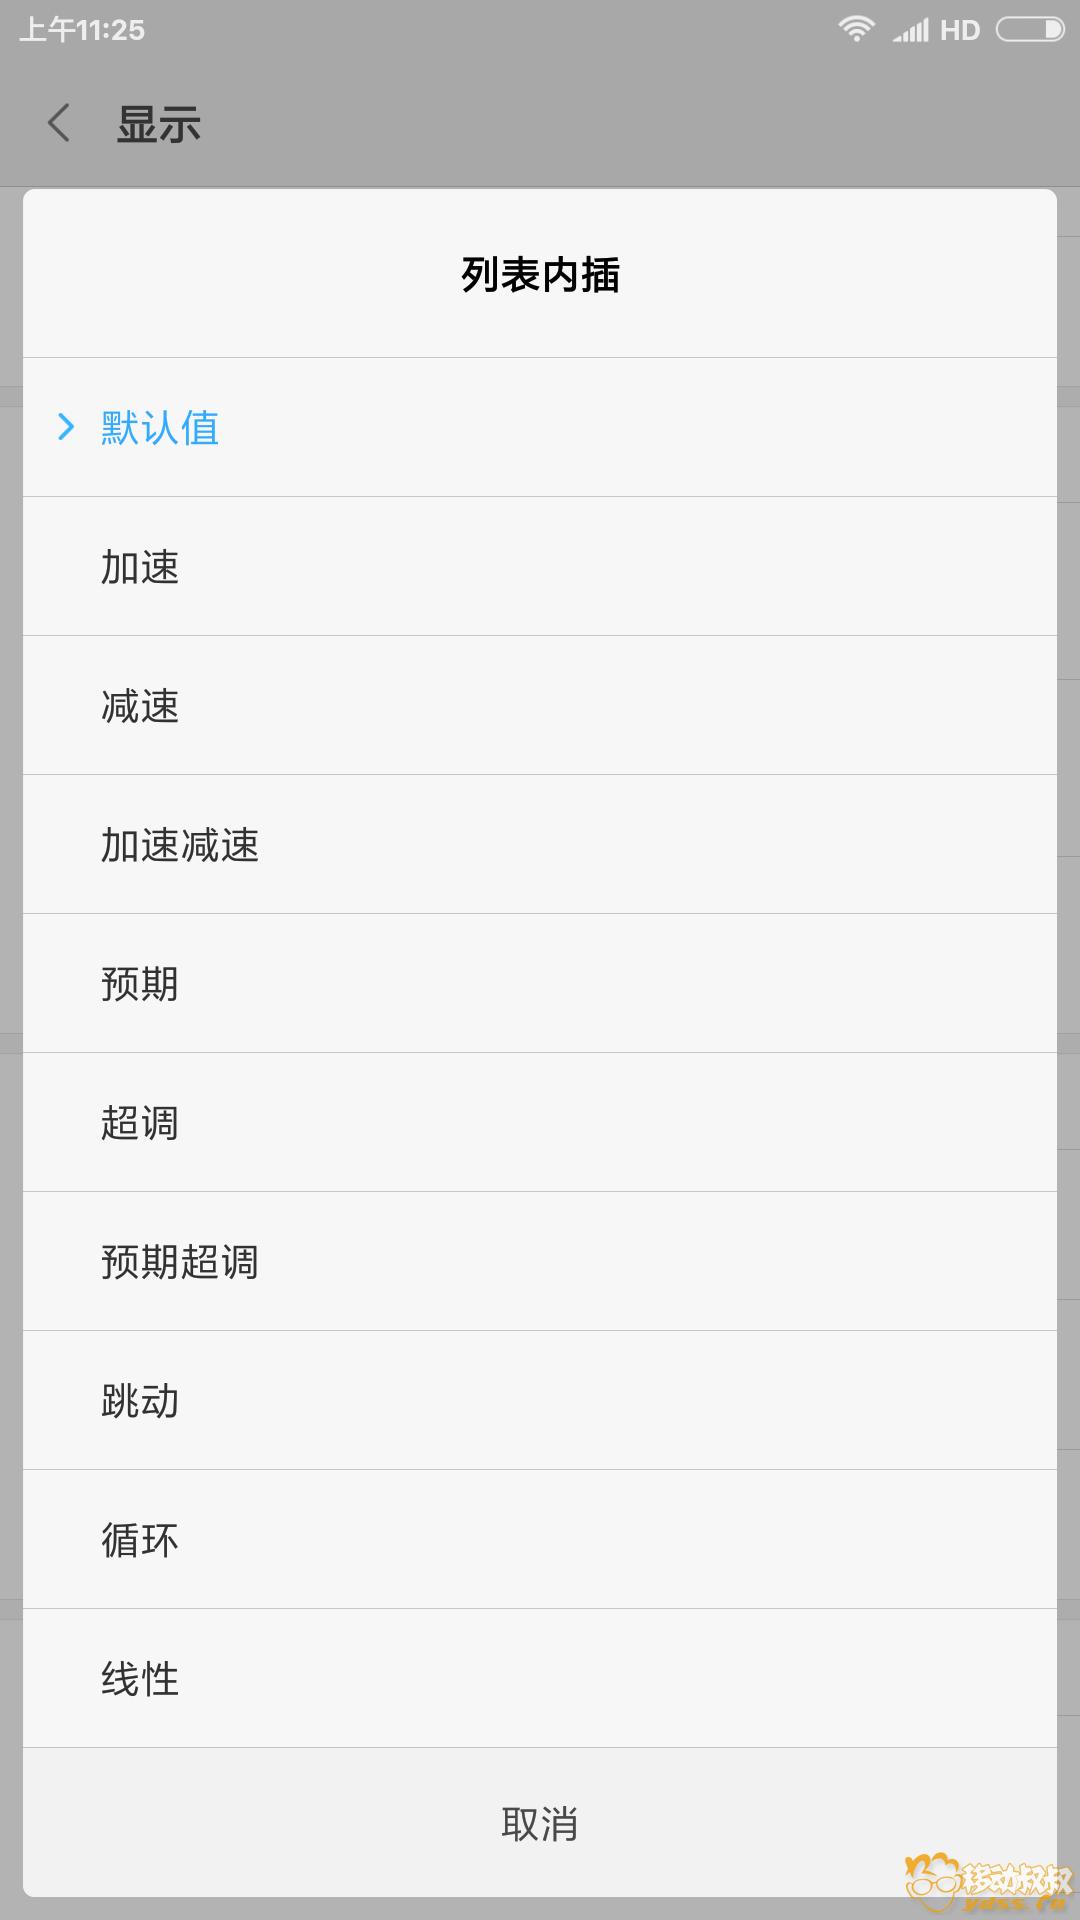 Screenshot_2018-05-04-11-25-08-604_com.android.settings.png